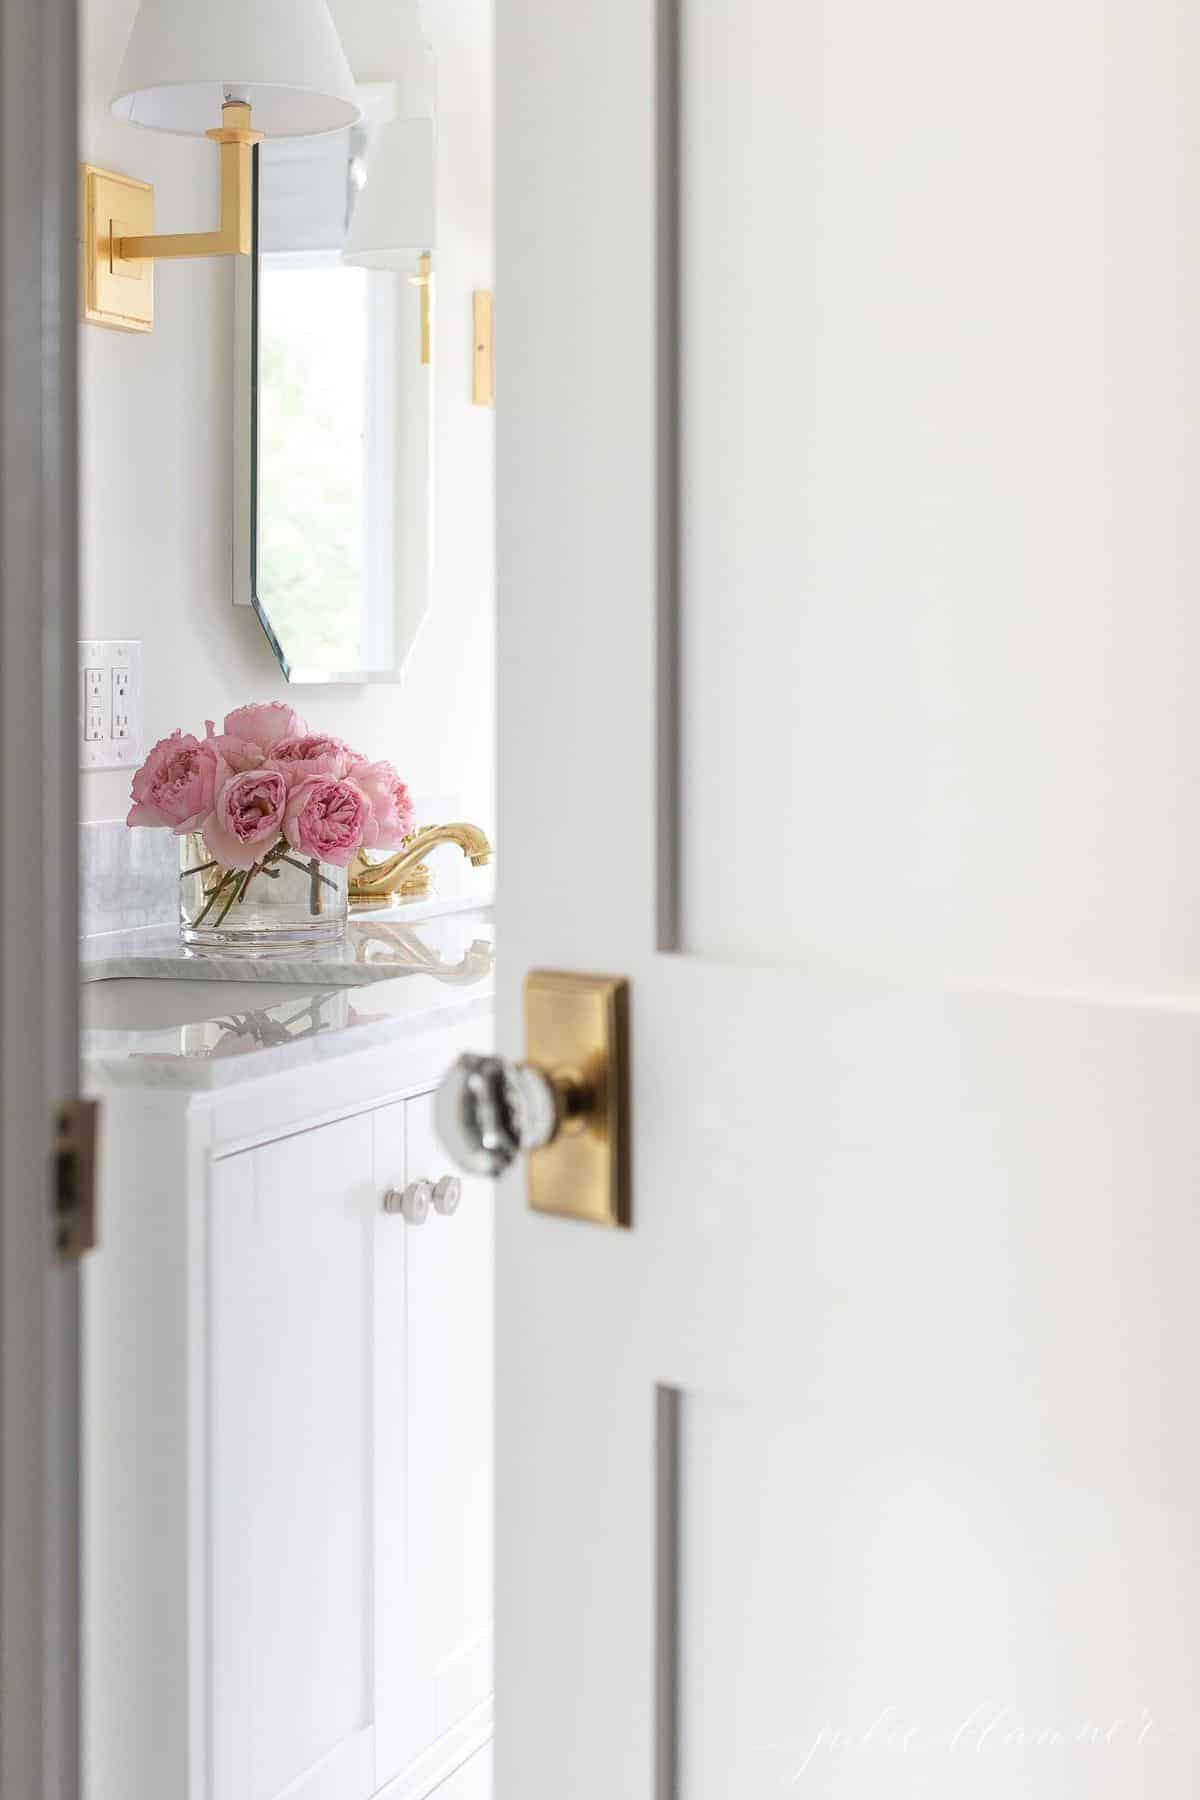 Peaking into a white bathroom past a door that's ajar. #spatub #airtub #showerniche